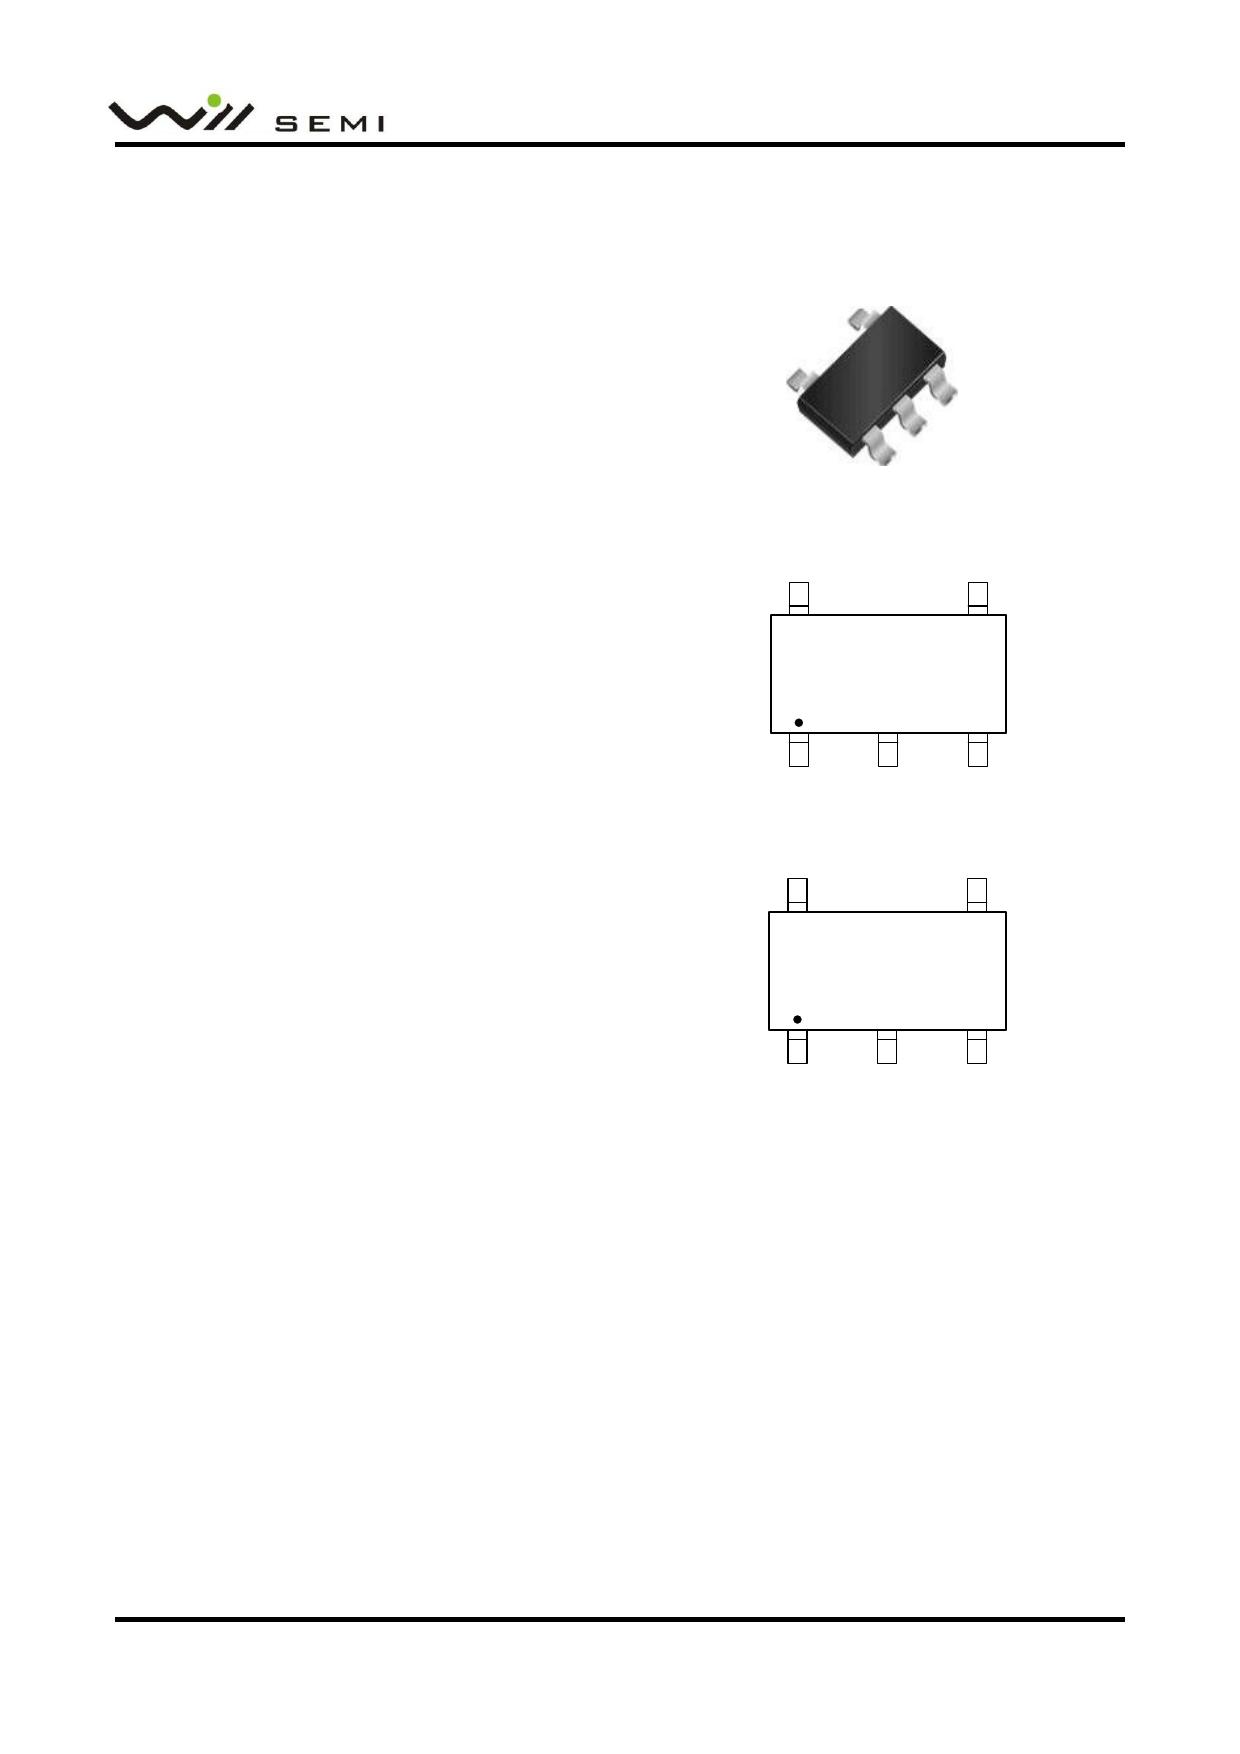 WL2803E datasheet, circuit